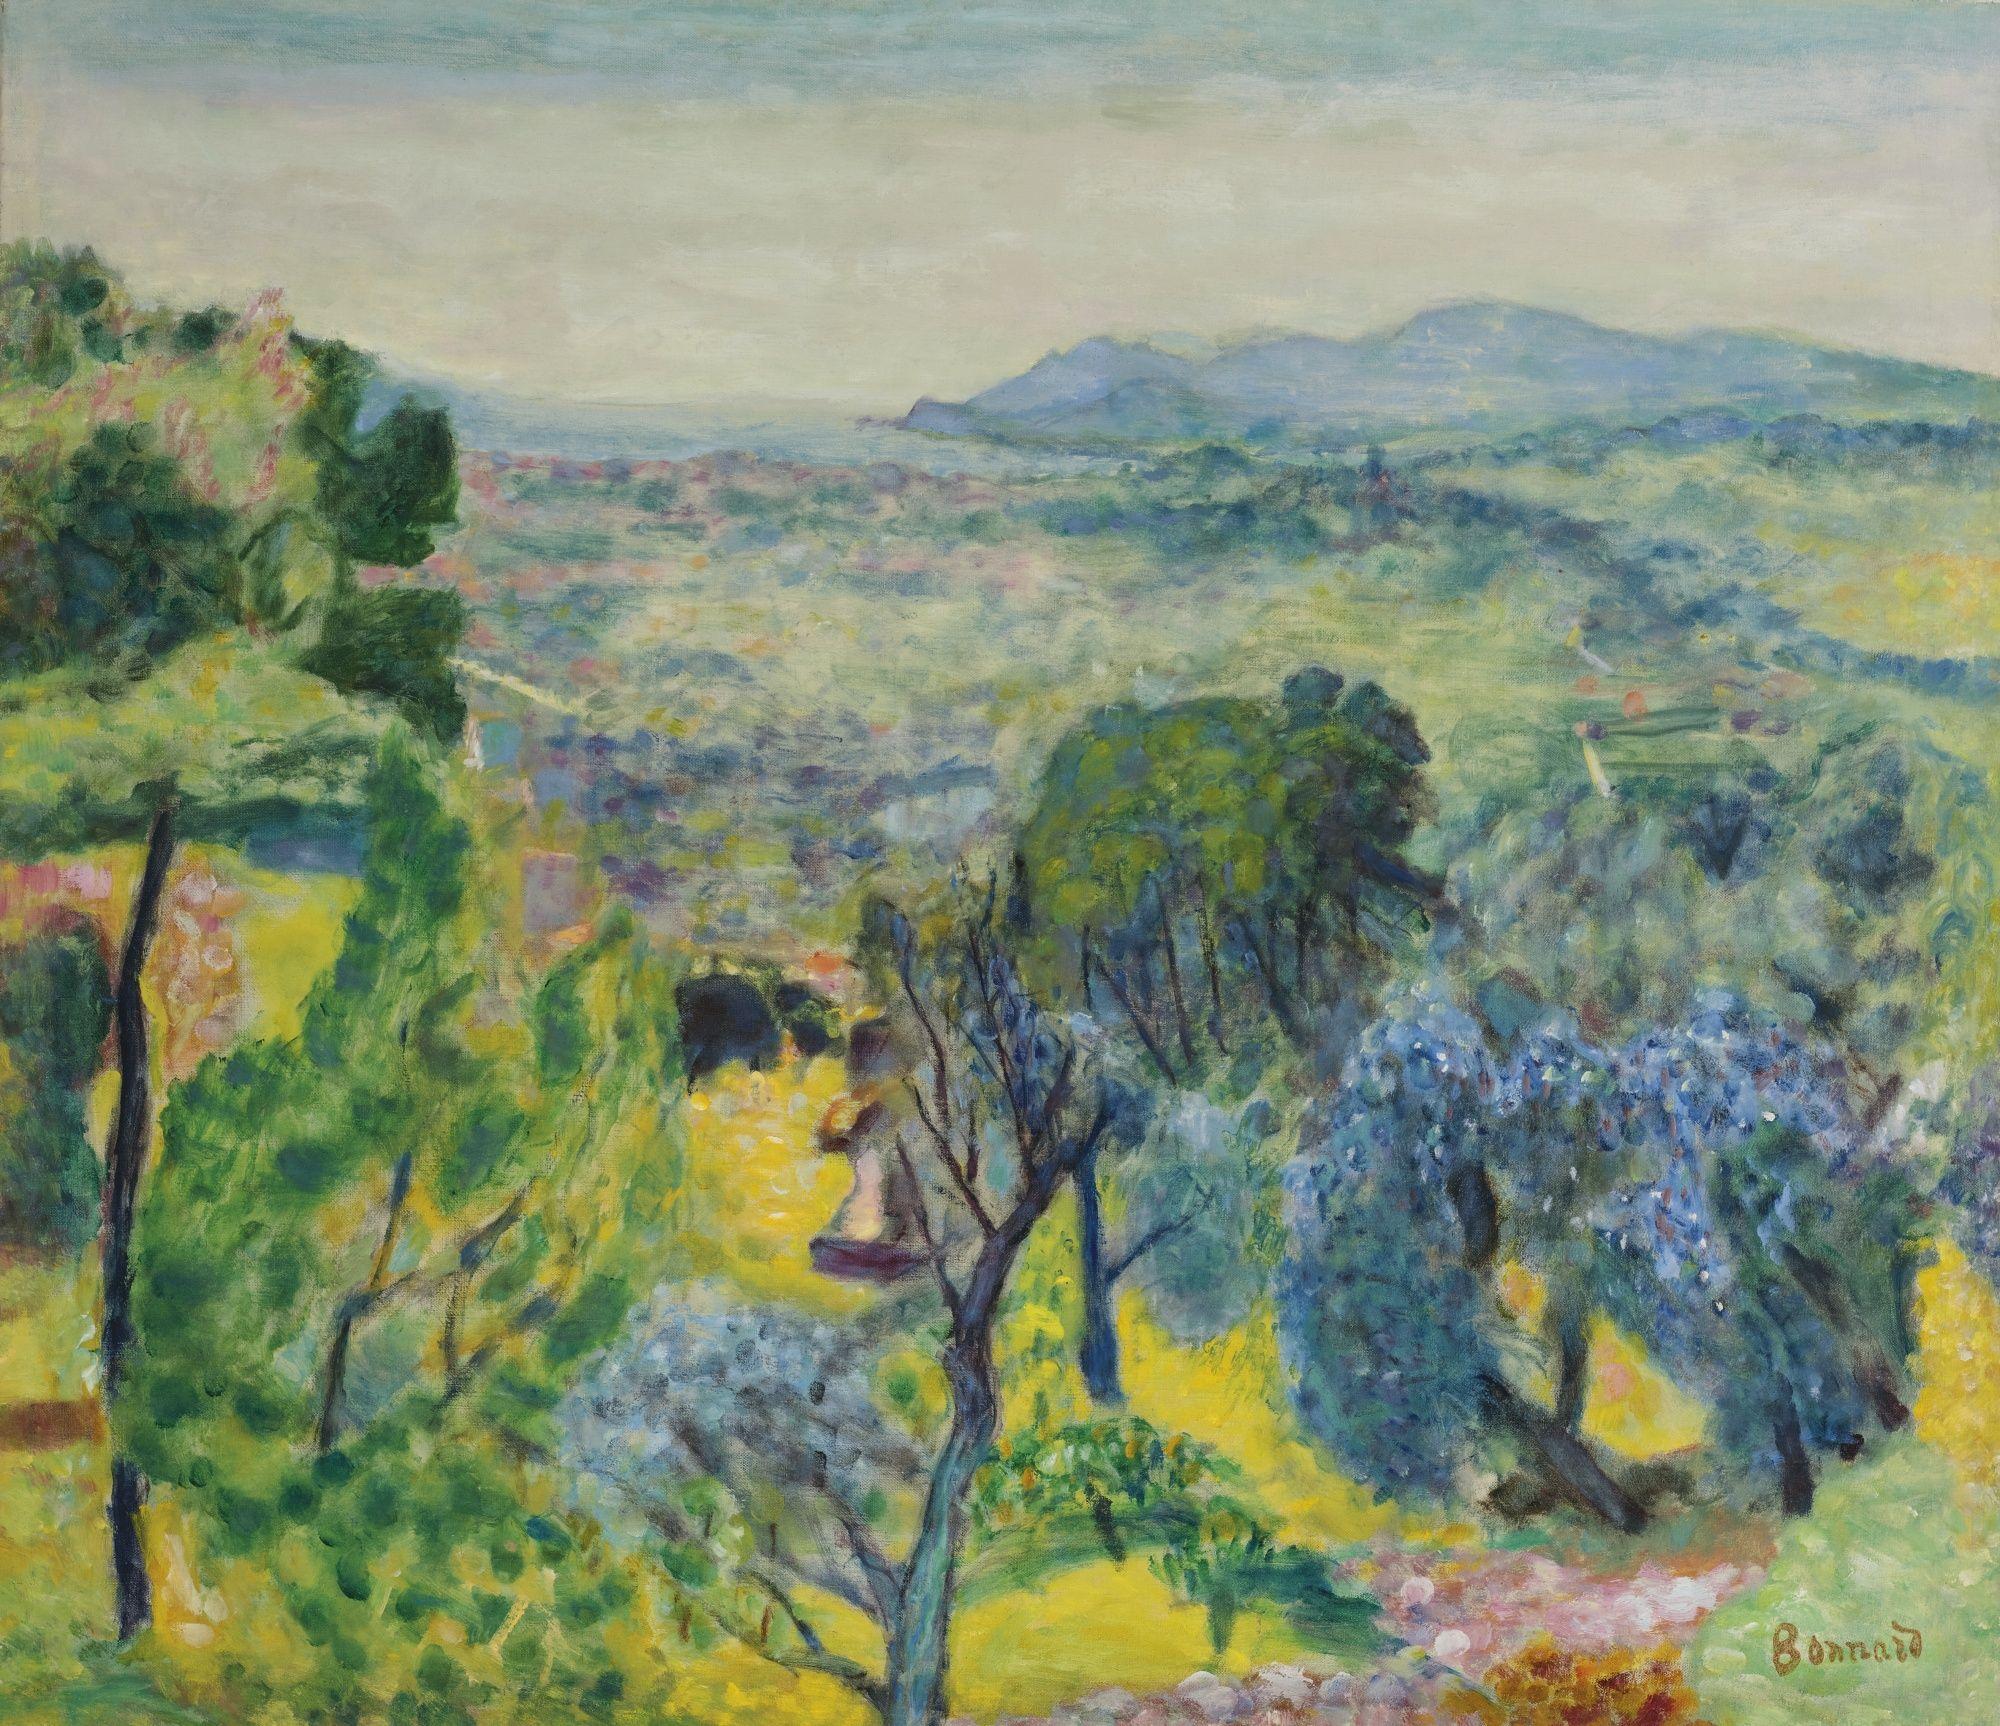 Bonnard google pierre bonnard painting for Paesaggi da disegnare facili